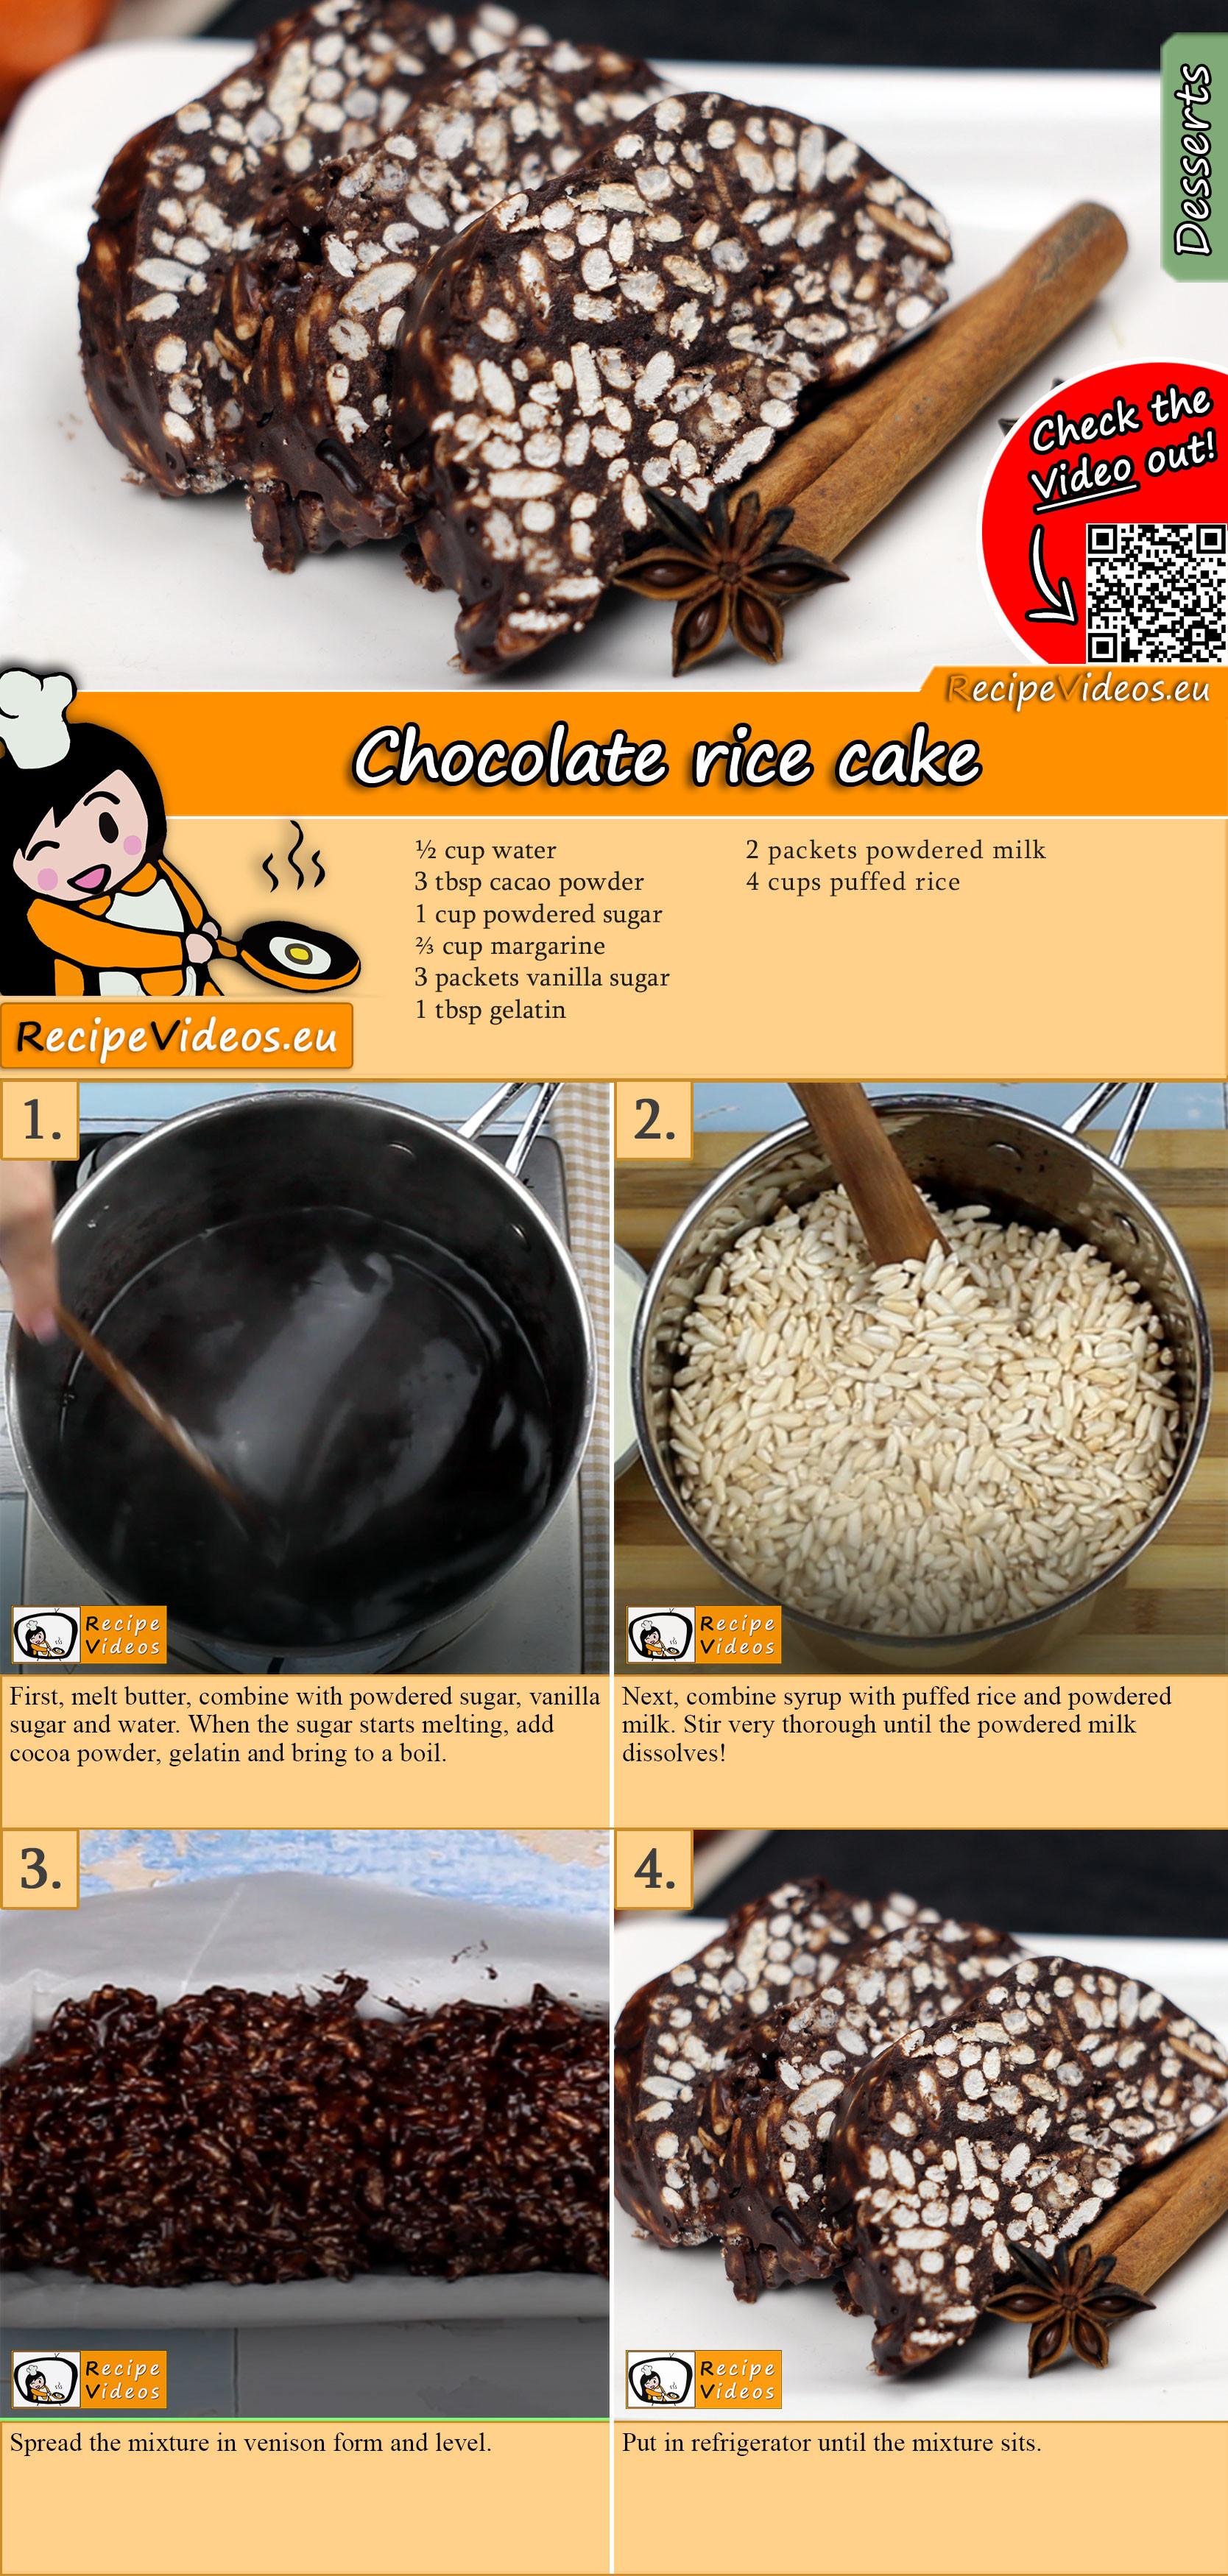 Chocolate rice cake recipe with video